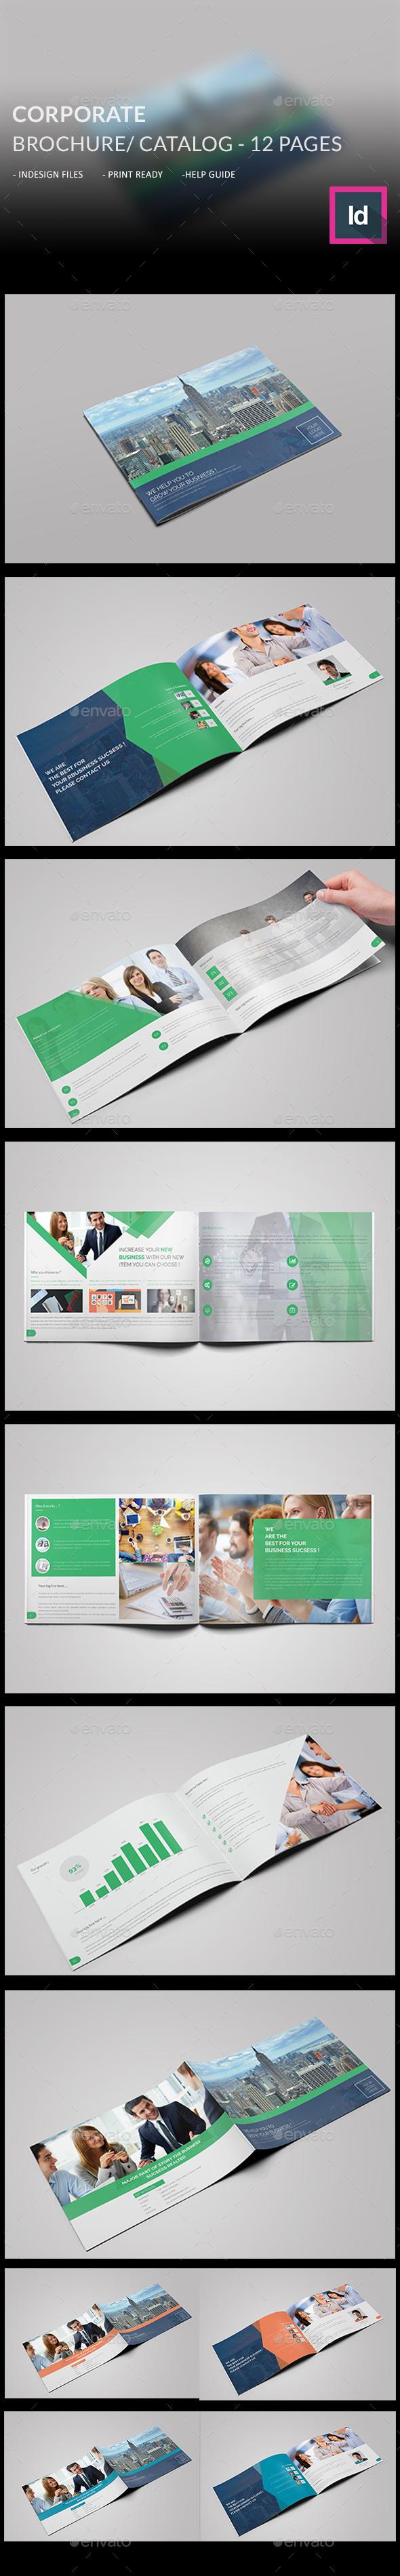 Corporate Brochure / Catalog  - Corporate Brochures